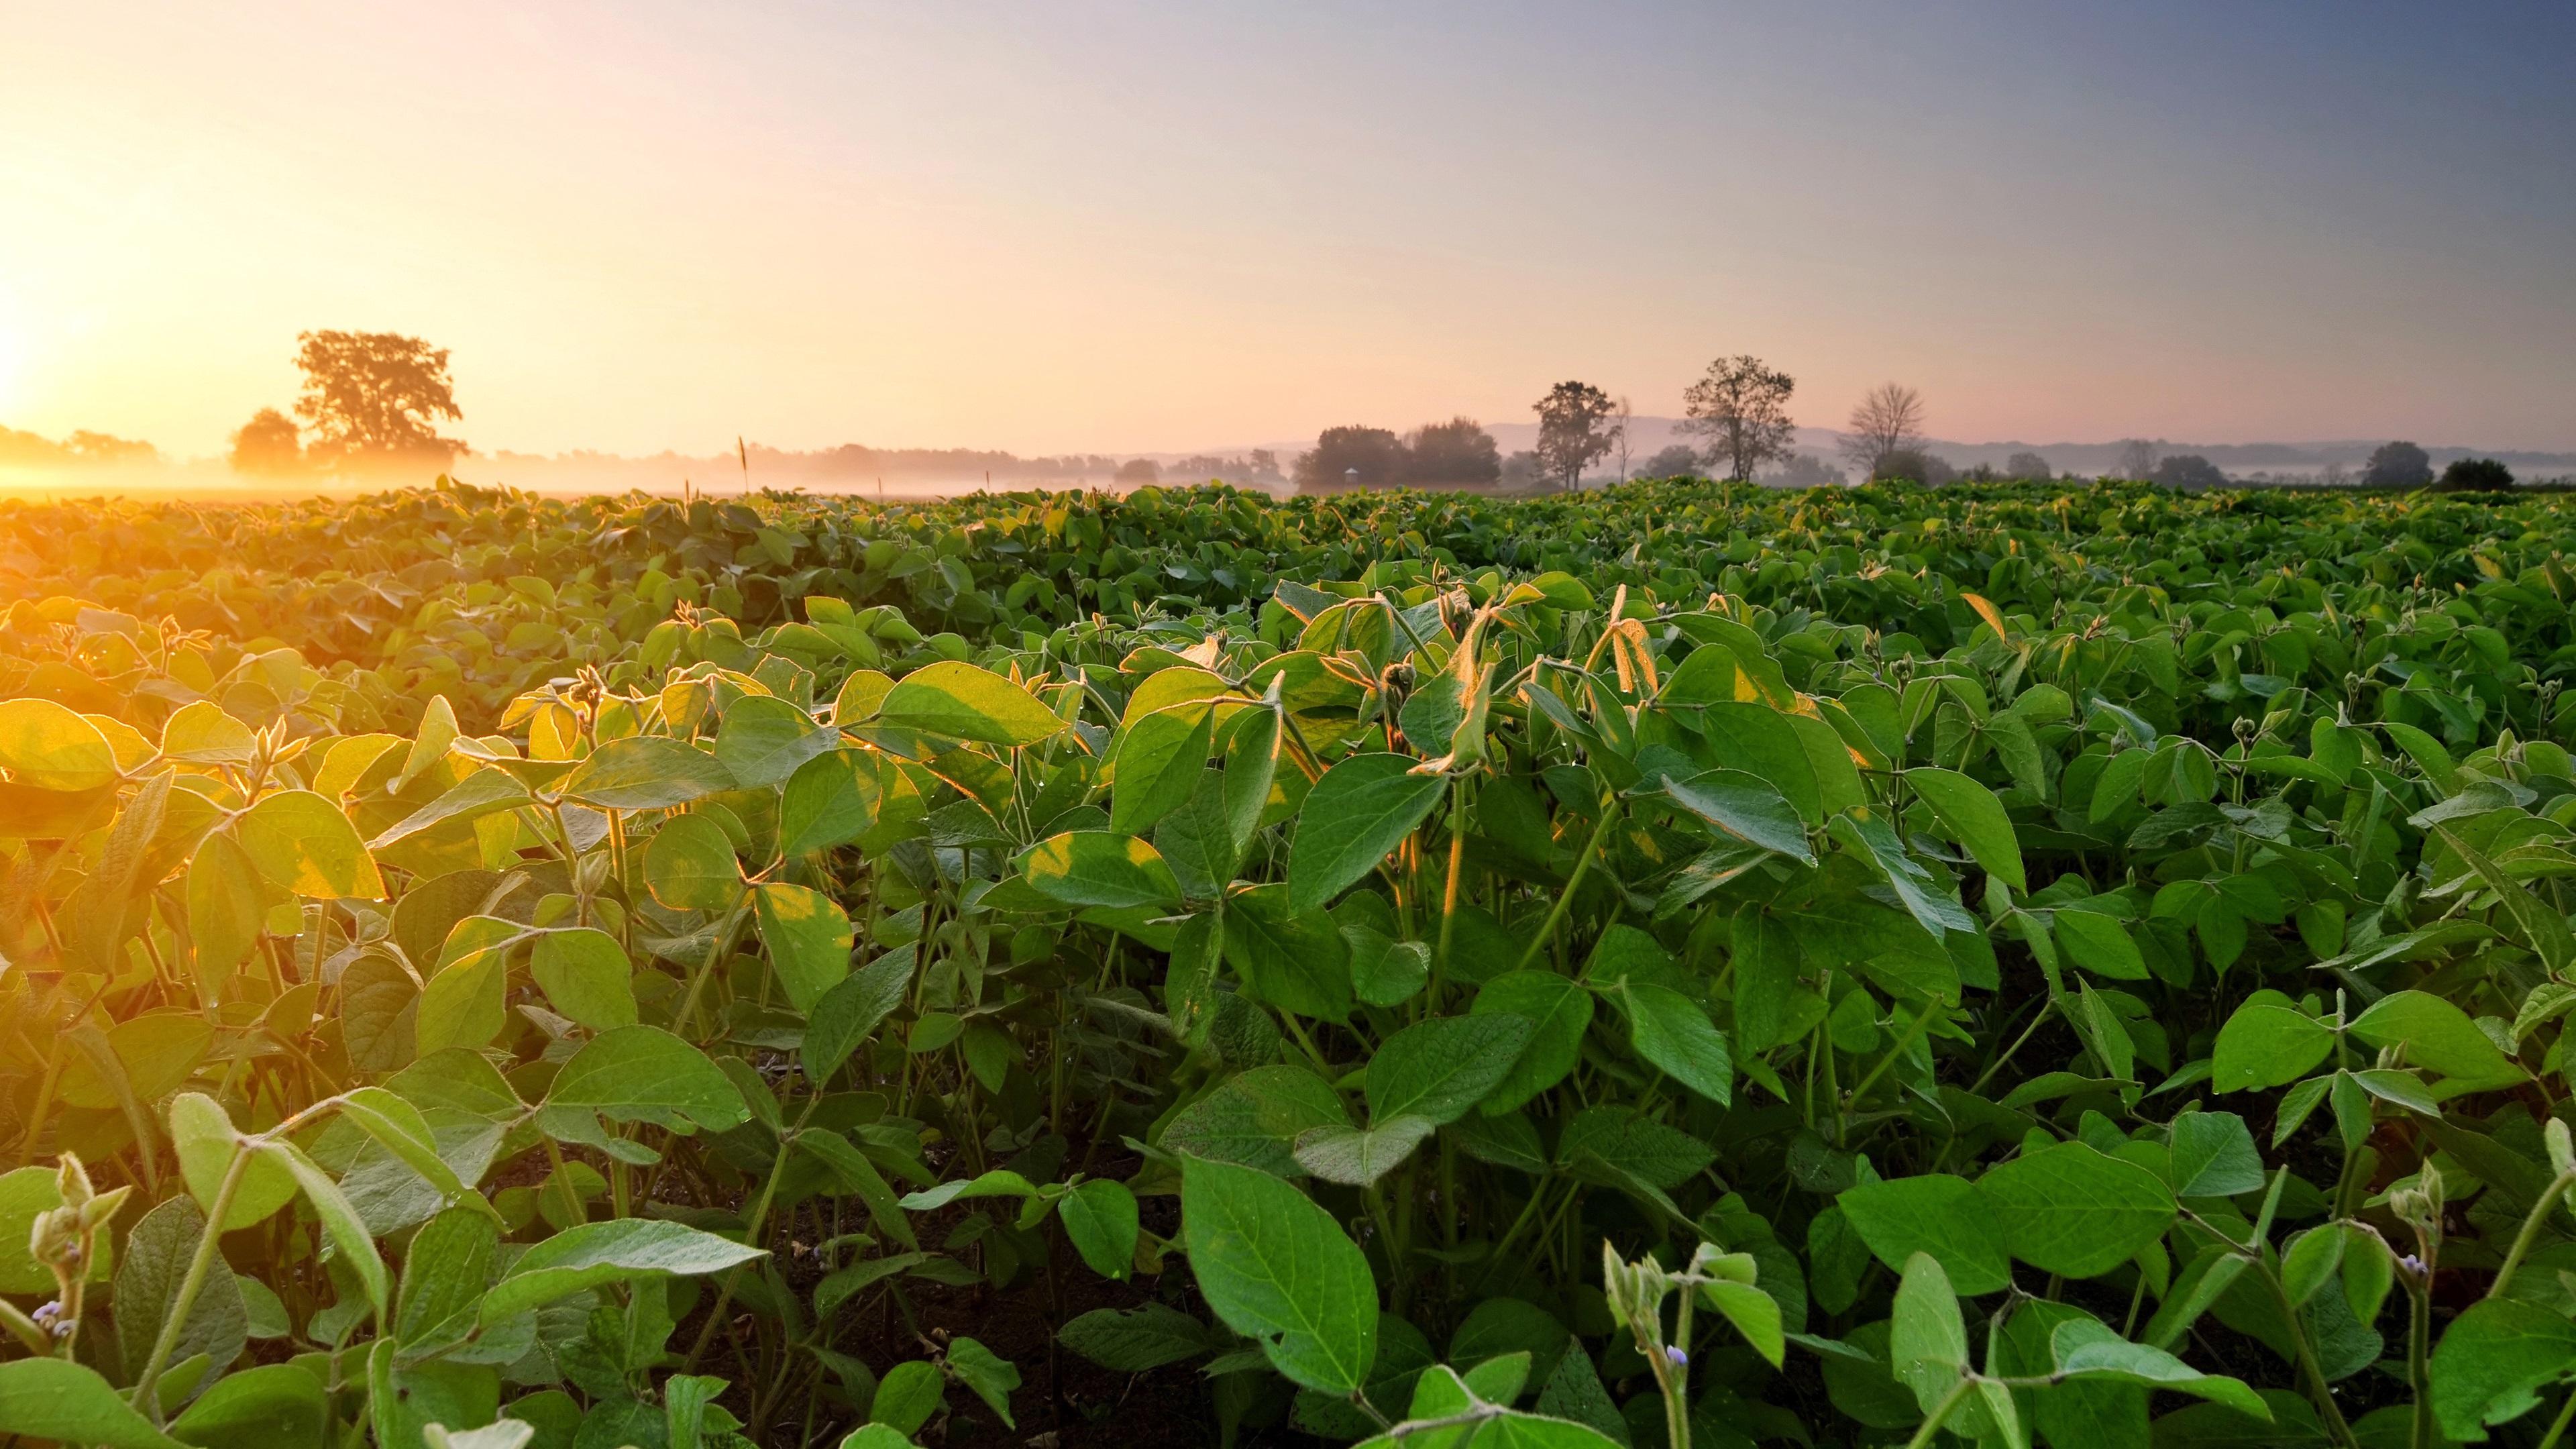 Wallpaper Soybean field fog dawn morning 3840x2160 UHD 4K 3840x2160